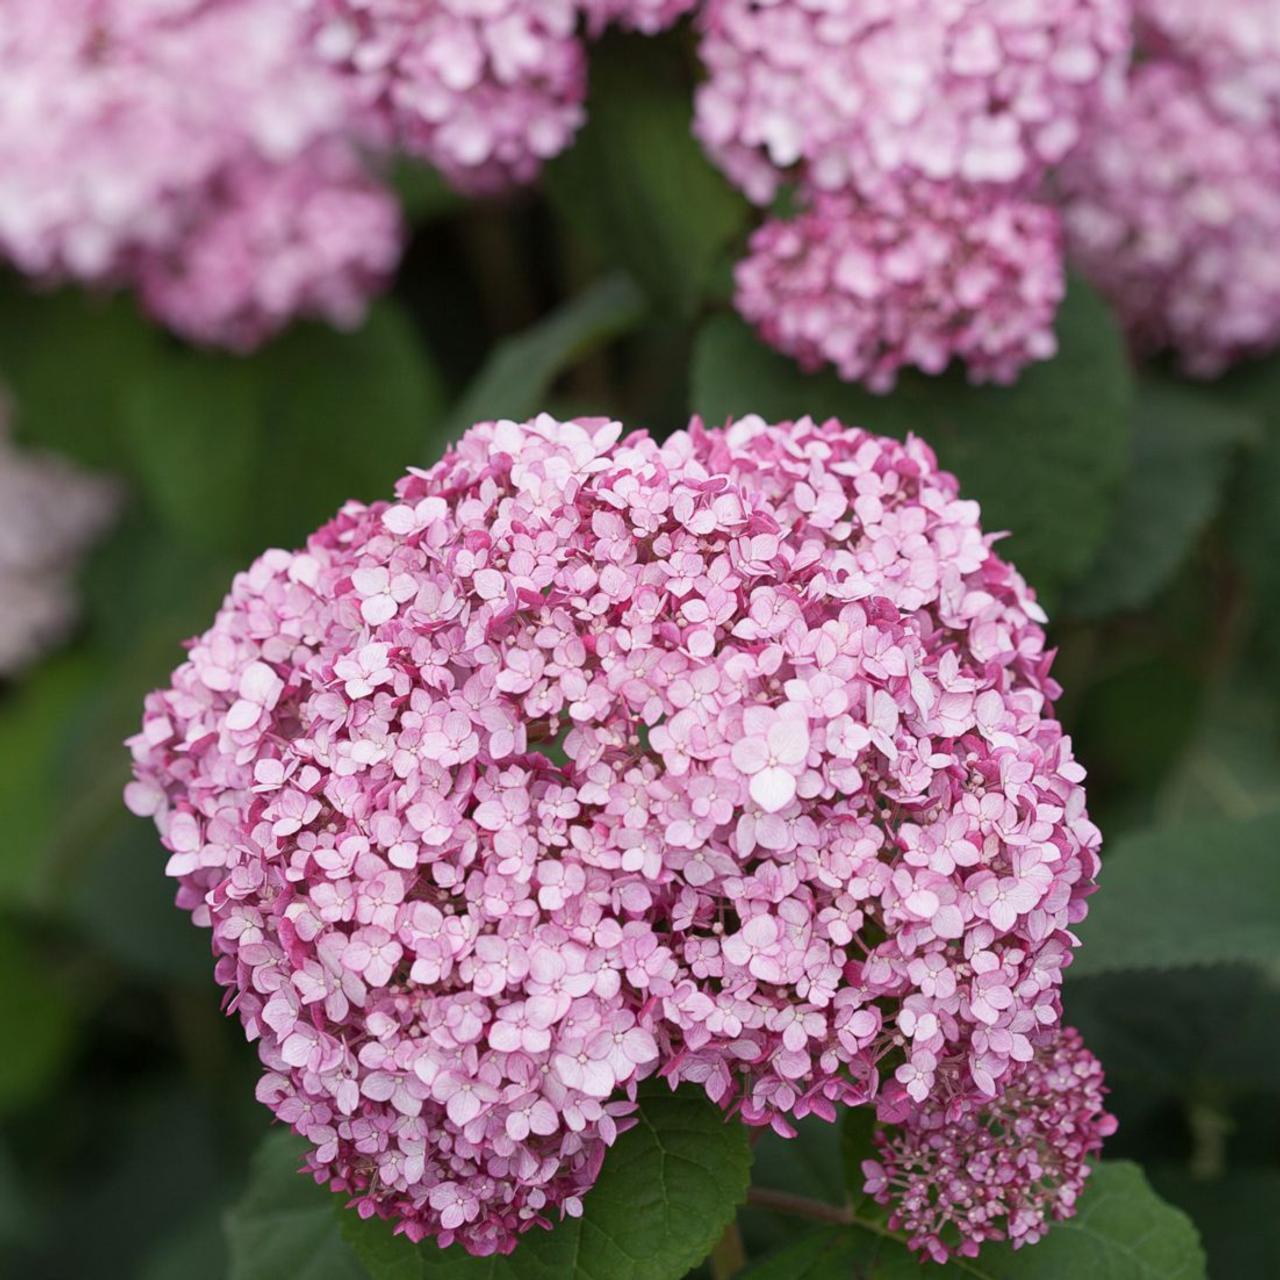 Hydrangea arborescens 'Sweet Annabelle' plant